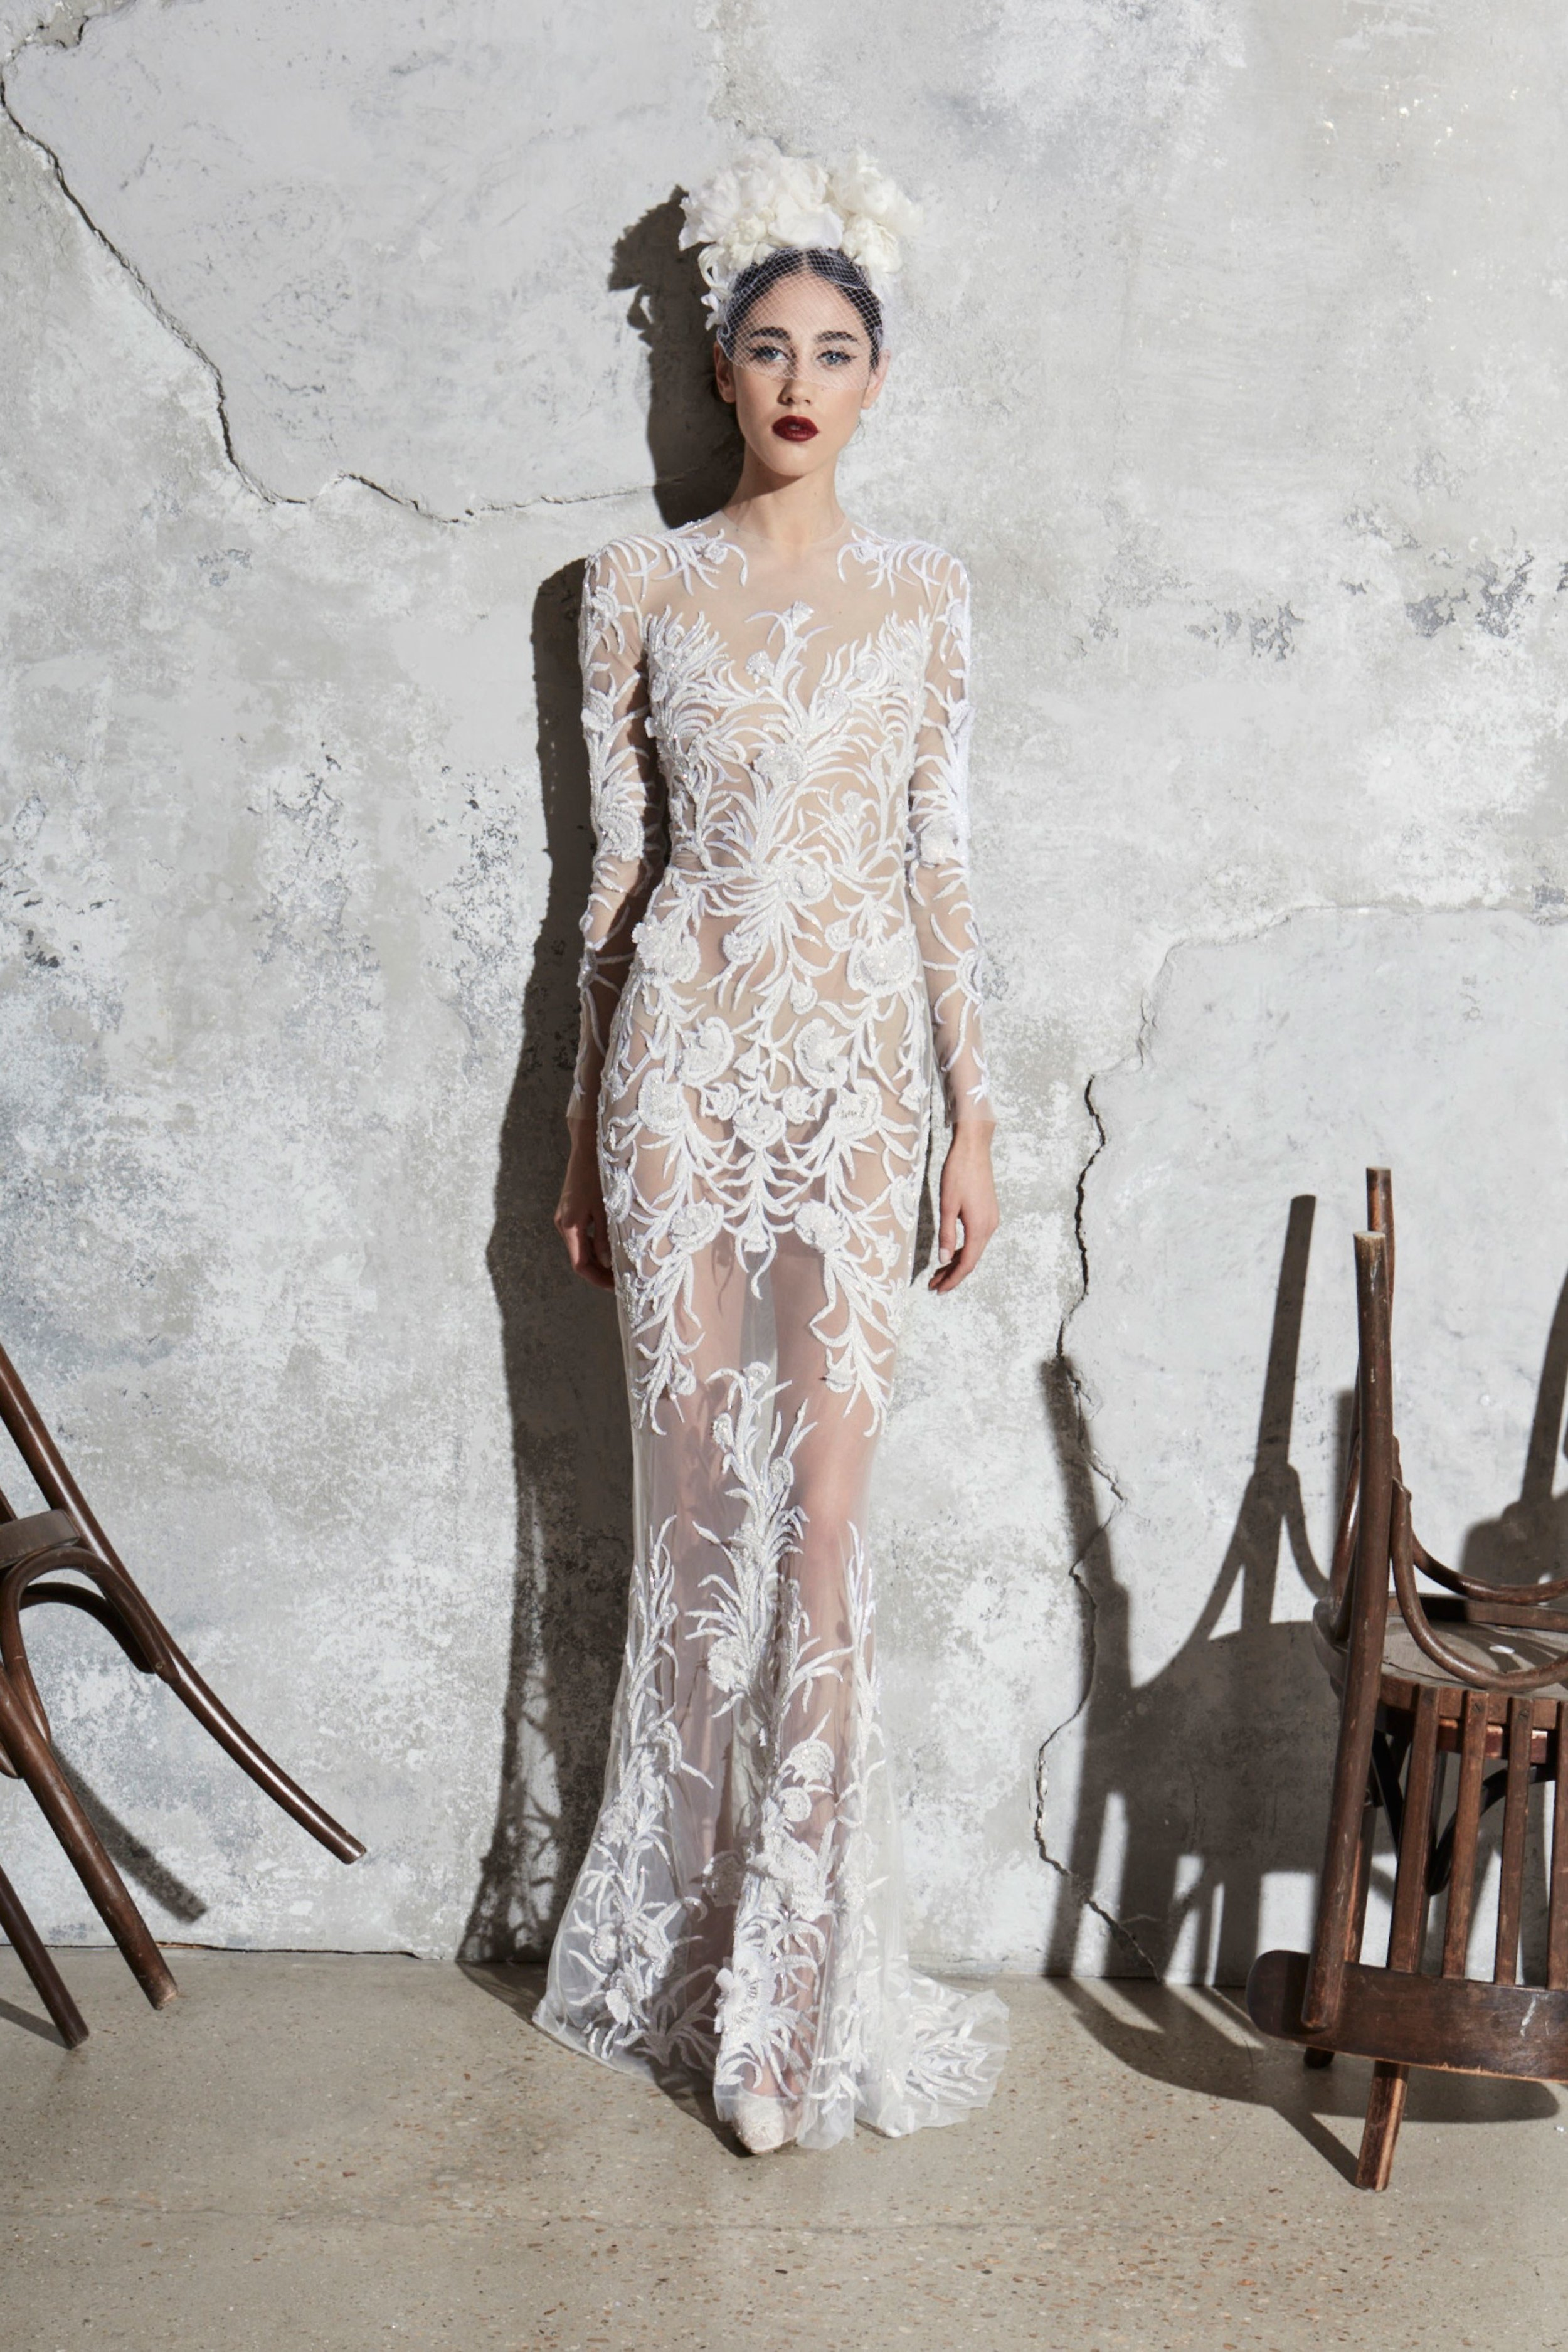 00011-zuhair-murad-new-york-bridal-Spring-2020-CREDIT-Thomas-Nutzl.jpg